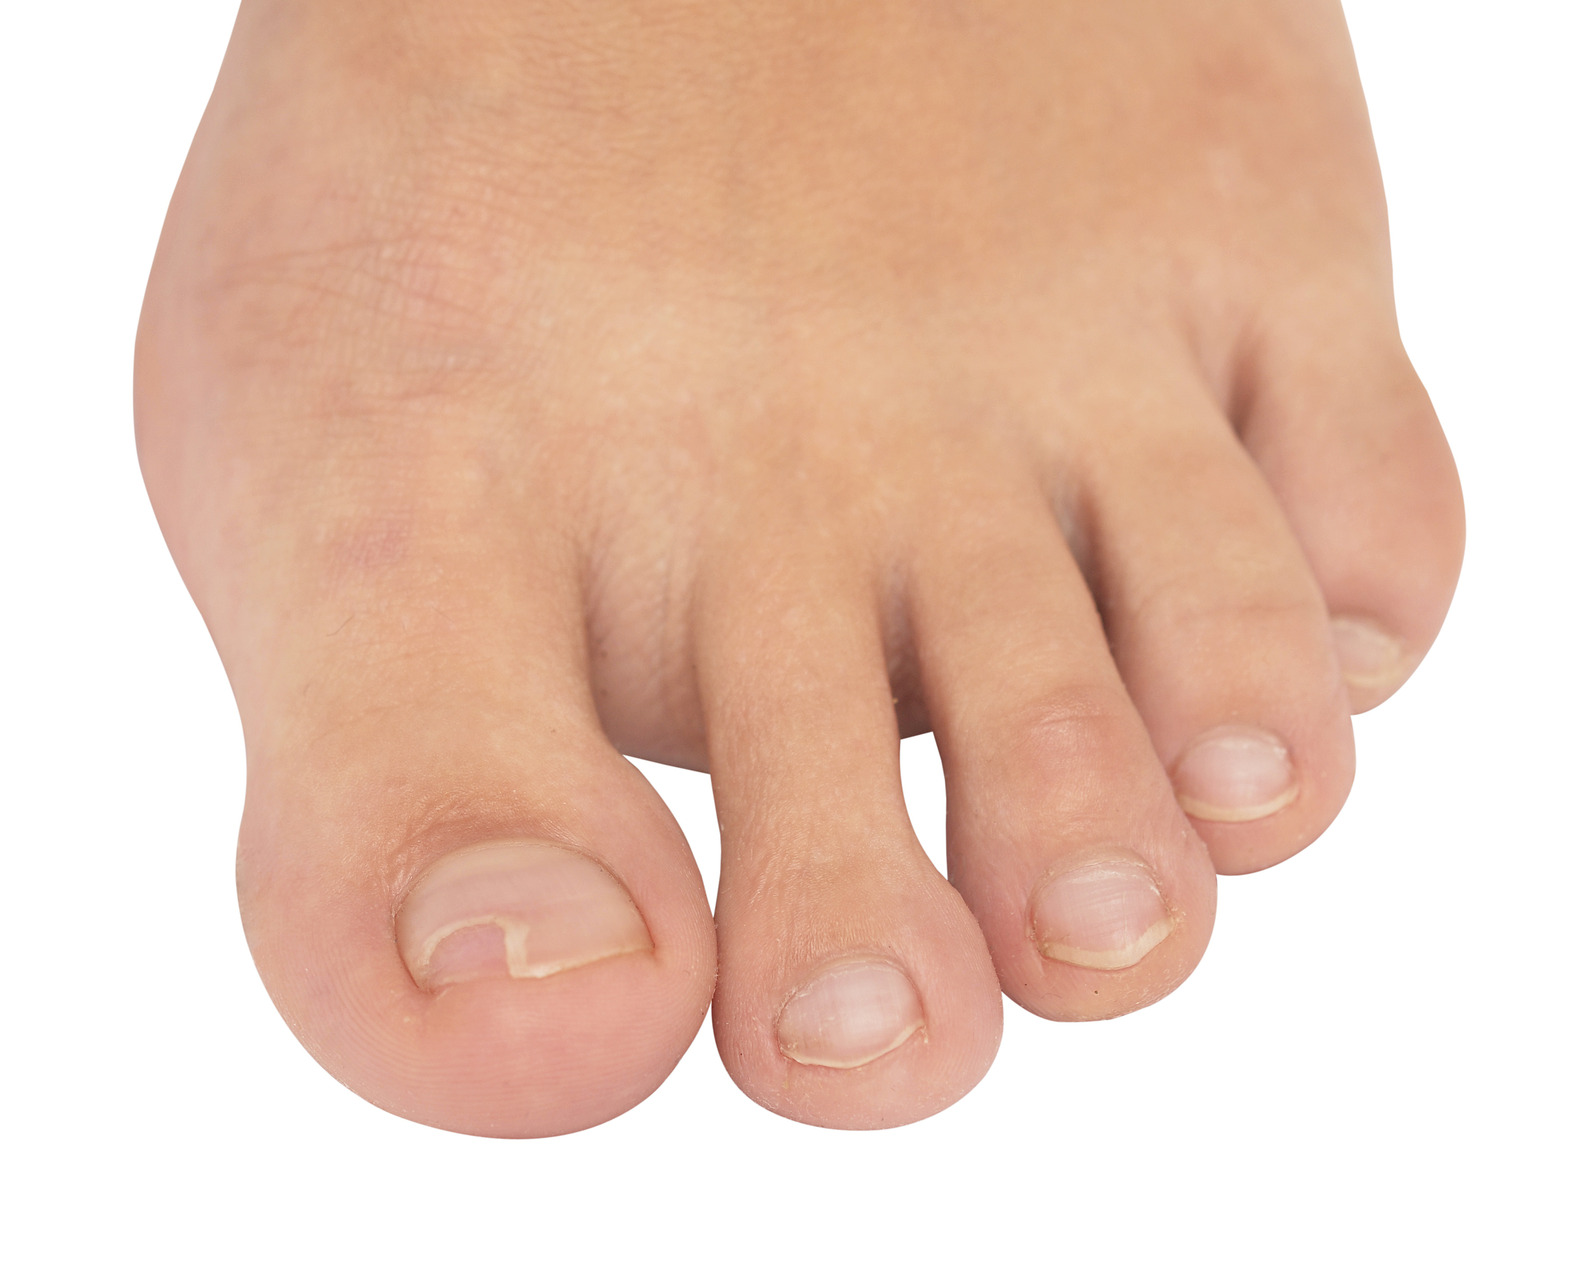 toenail fungus - Mississauga Foot Care Website